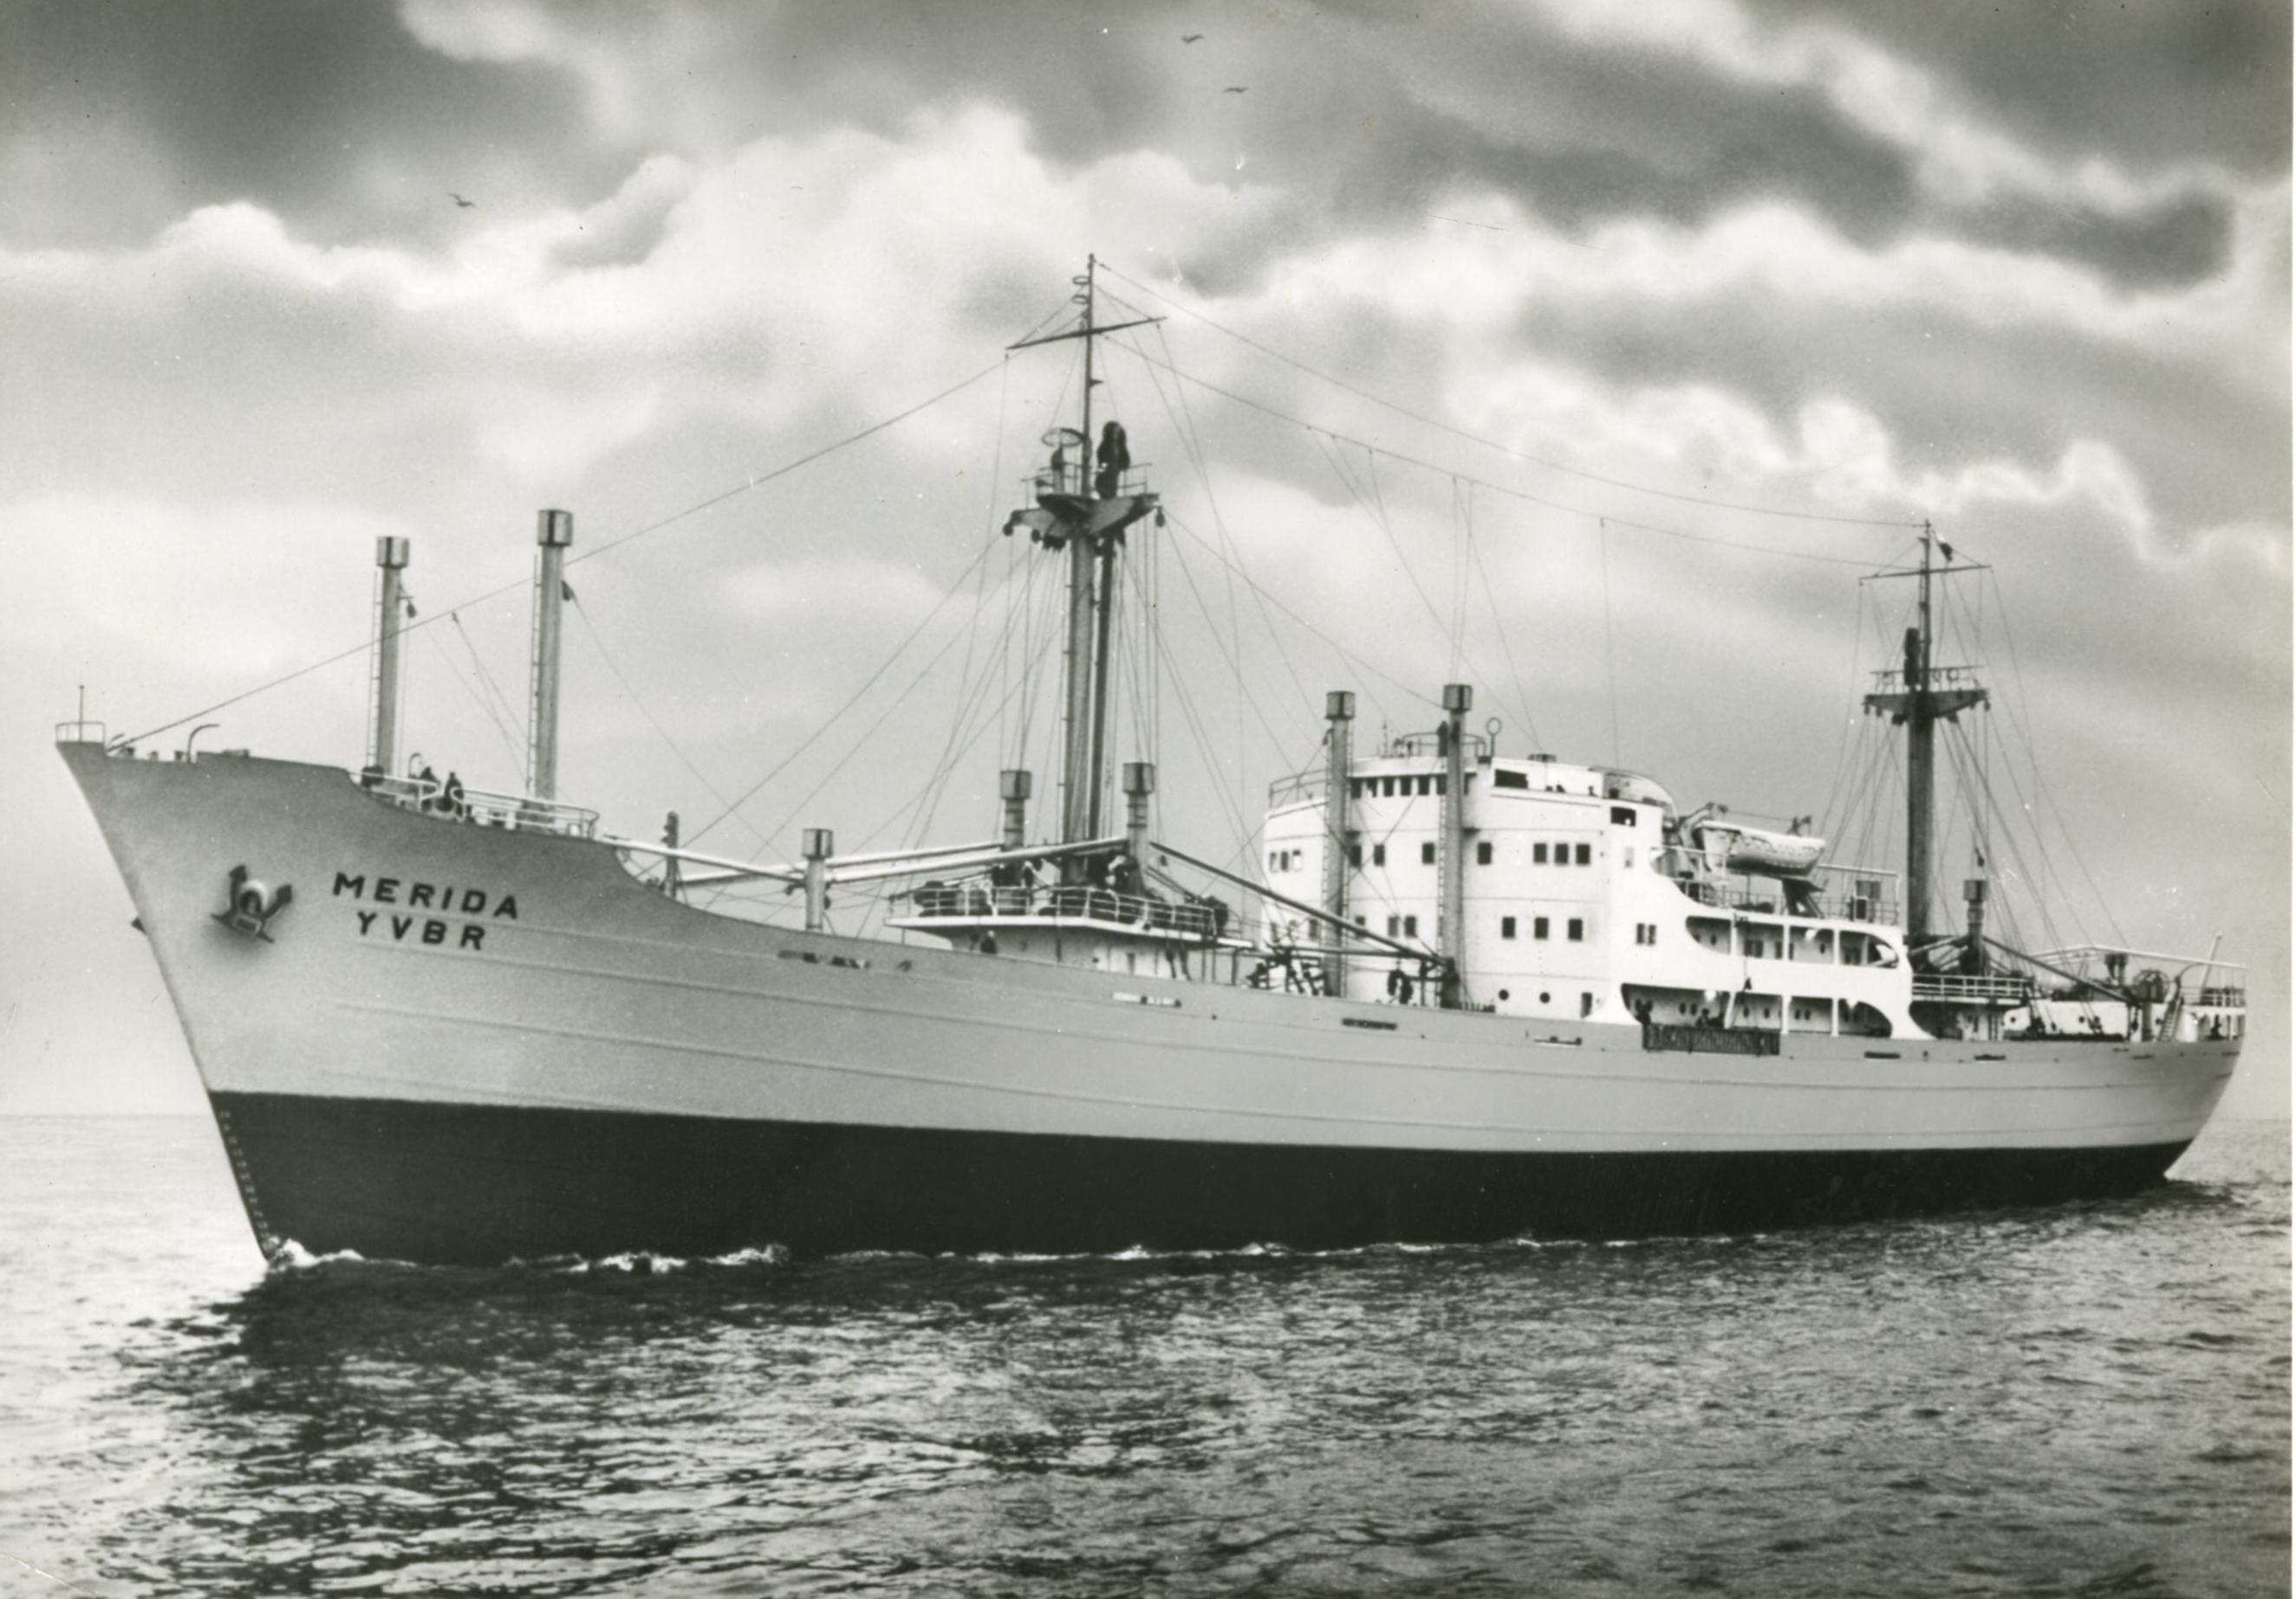 Merida (1955)